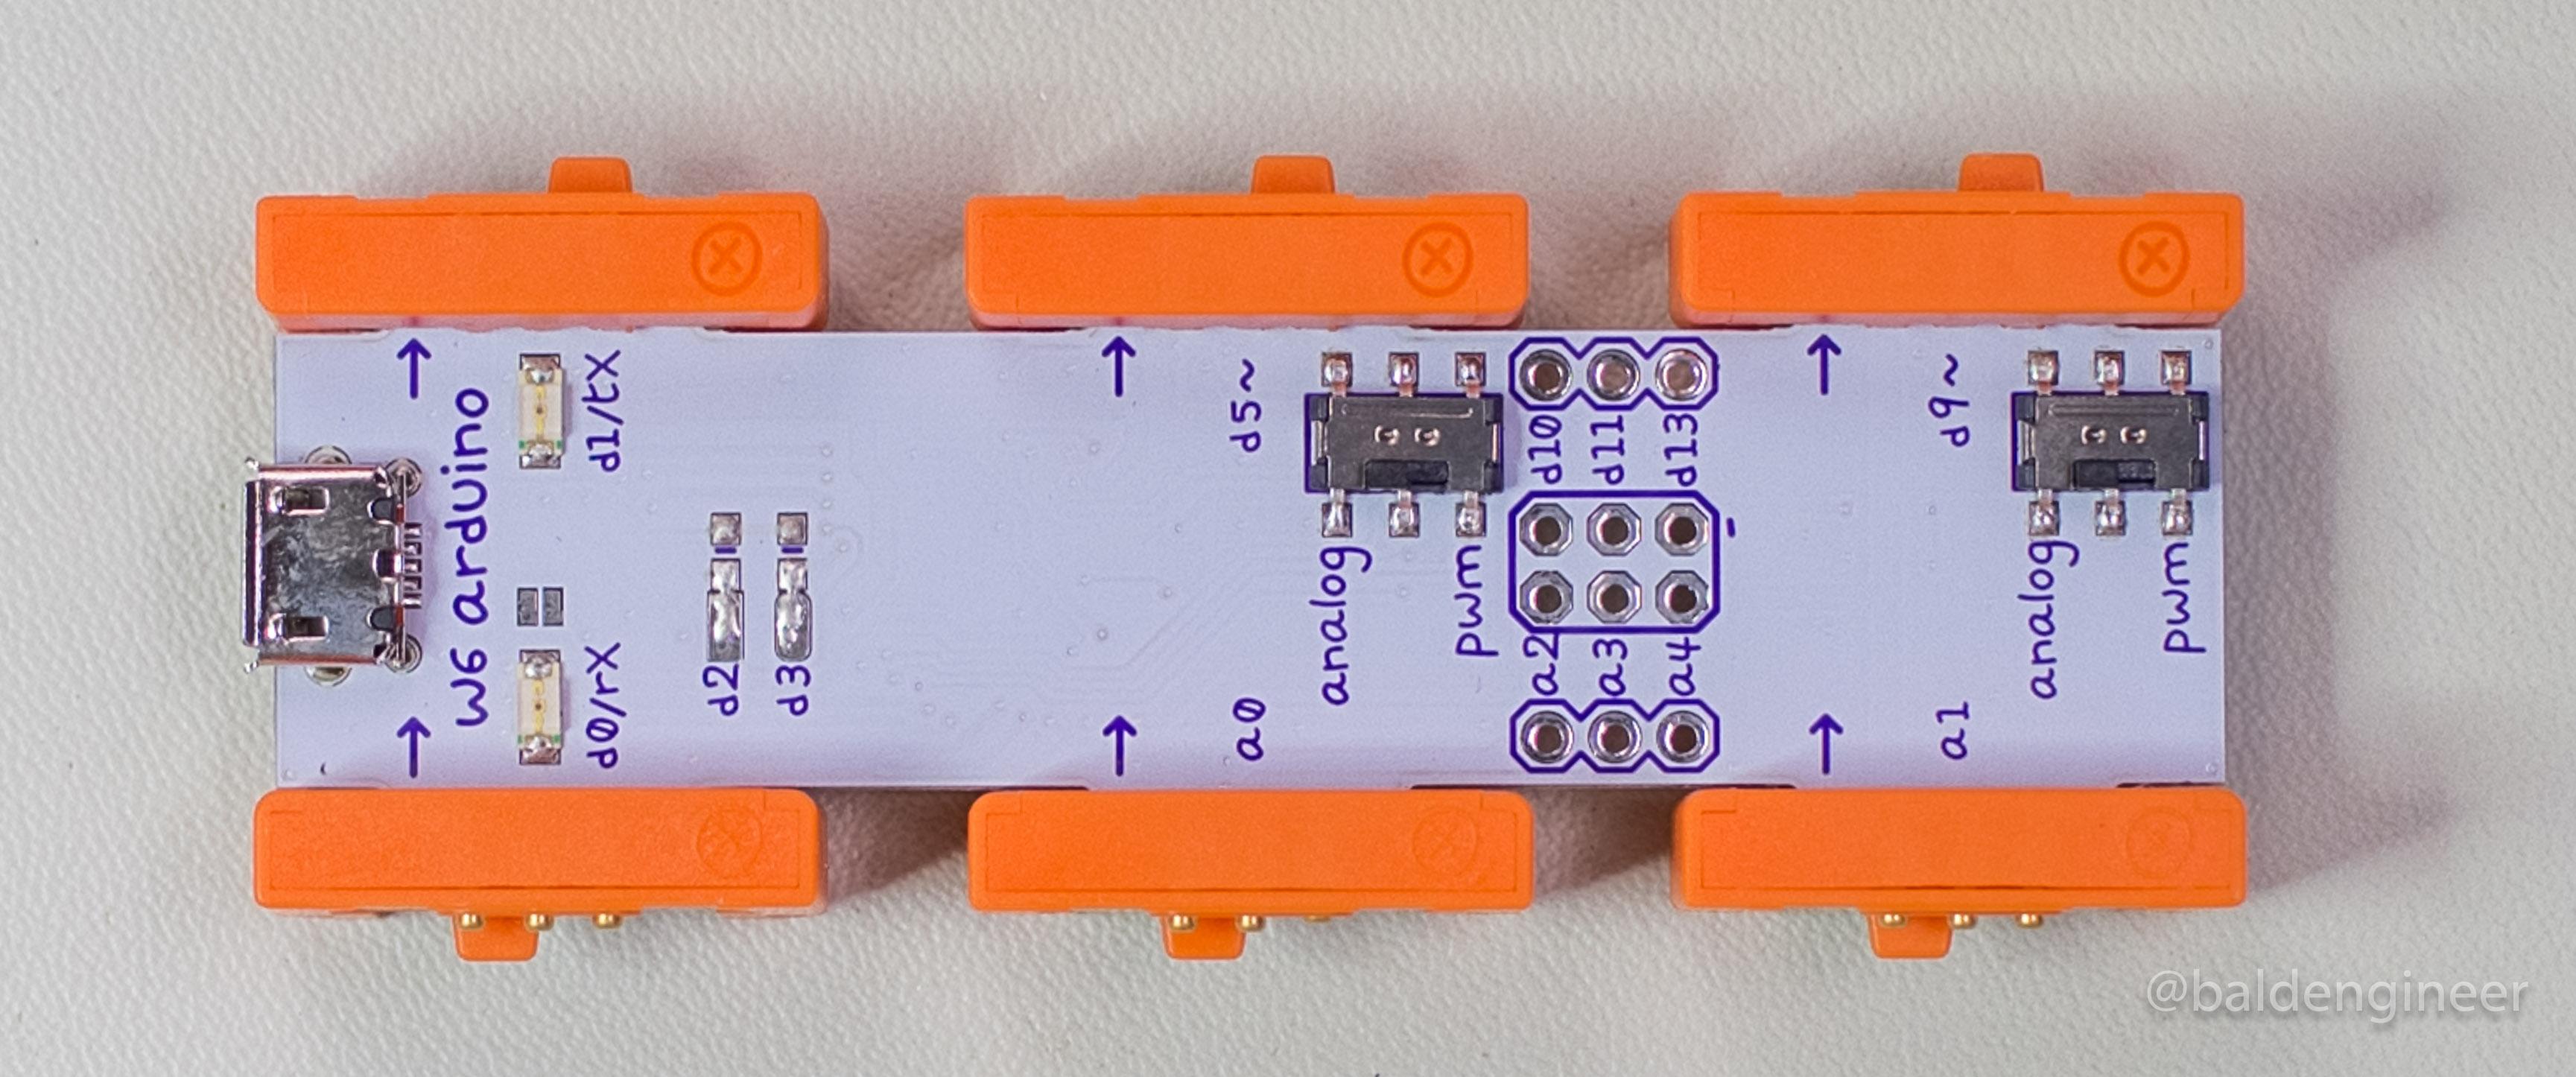 4b - littleBits Base Arduino